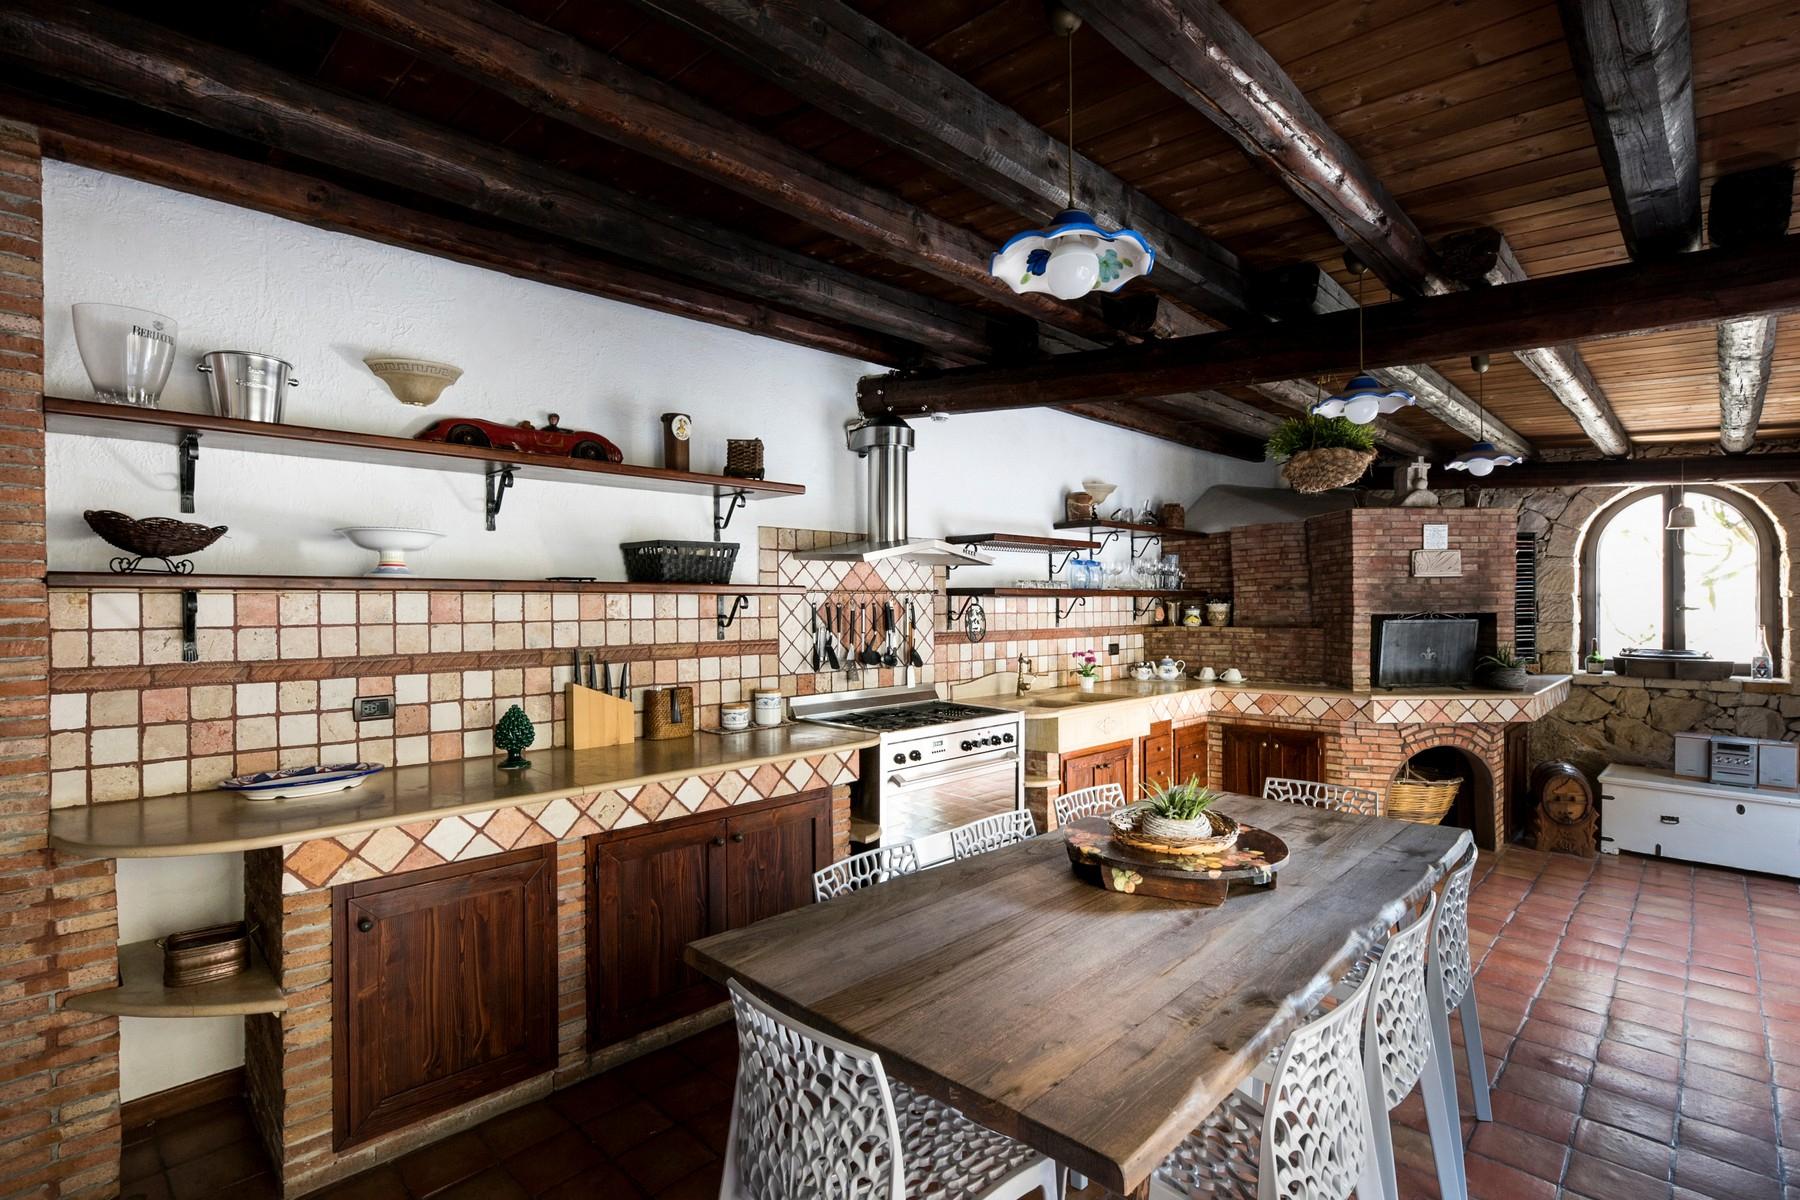 Casa indipendente in Vendita a Noto: 5 locali, 300 mq - Foto 5